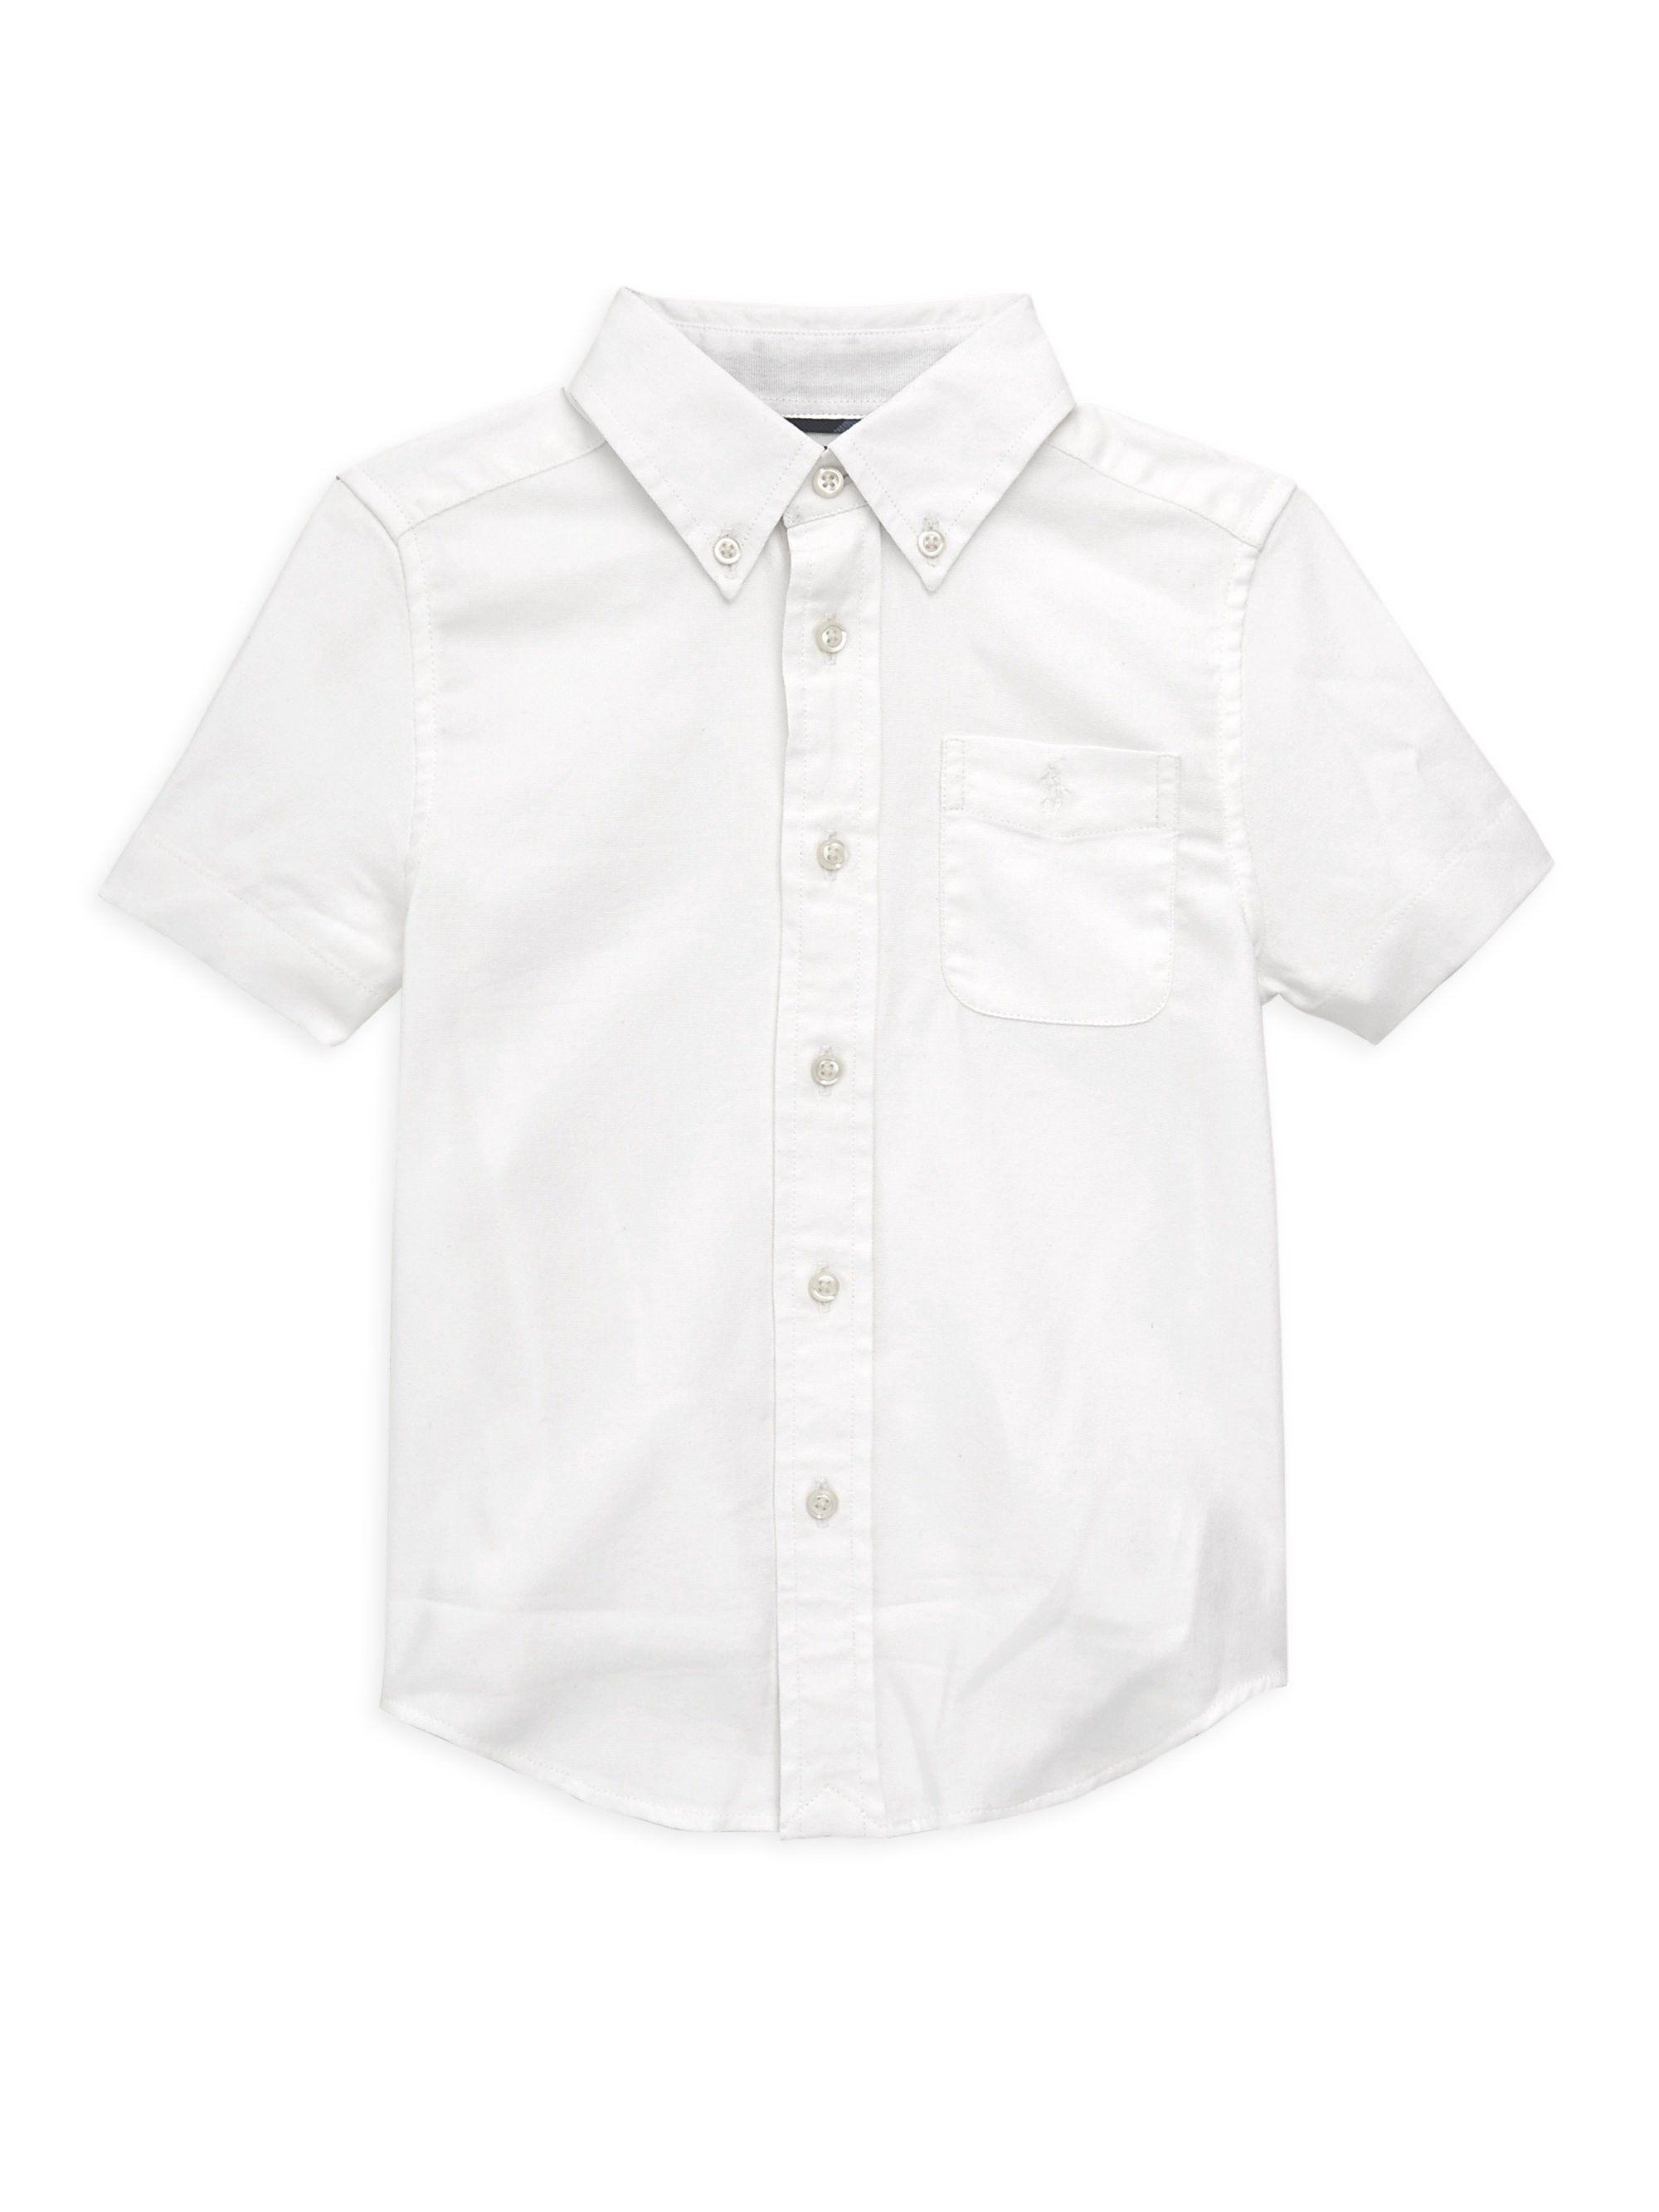 Ralph Lauren Toddler s, Little Boy s   Classic Stretch Collared Shirt -  White 4T 750016b1b4ca